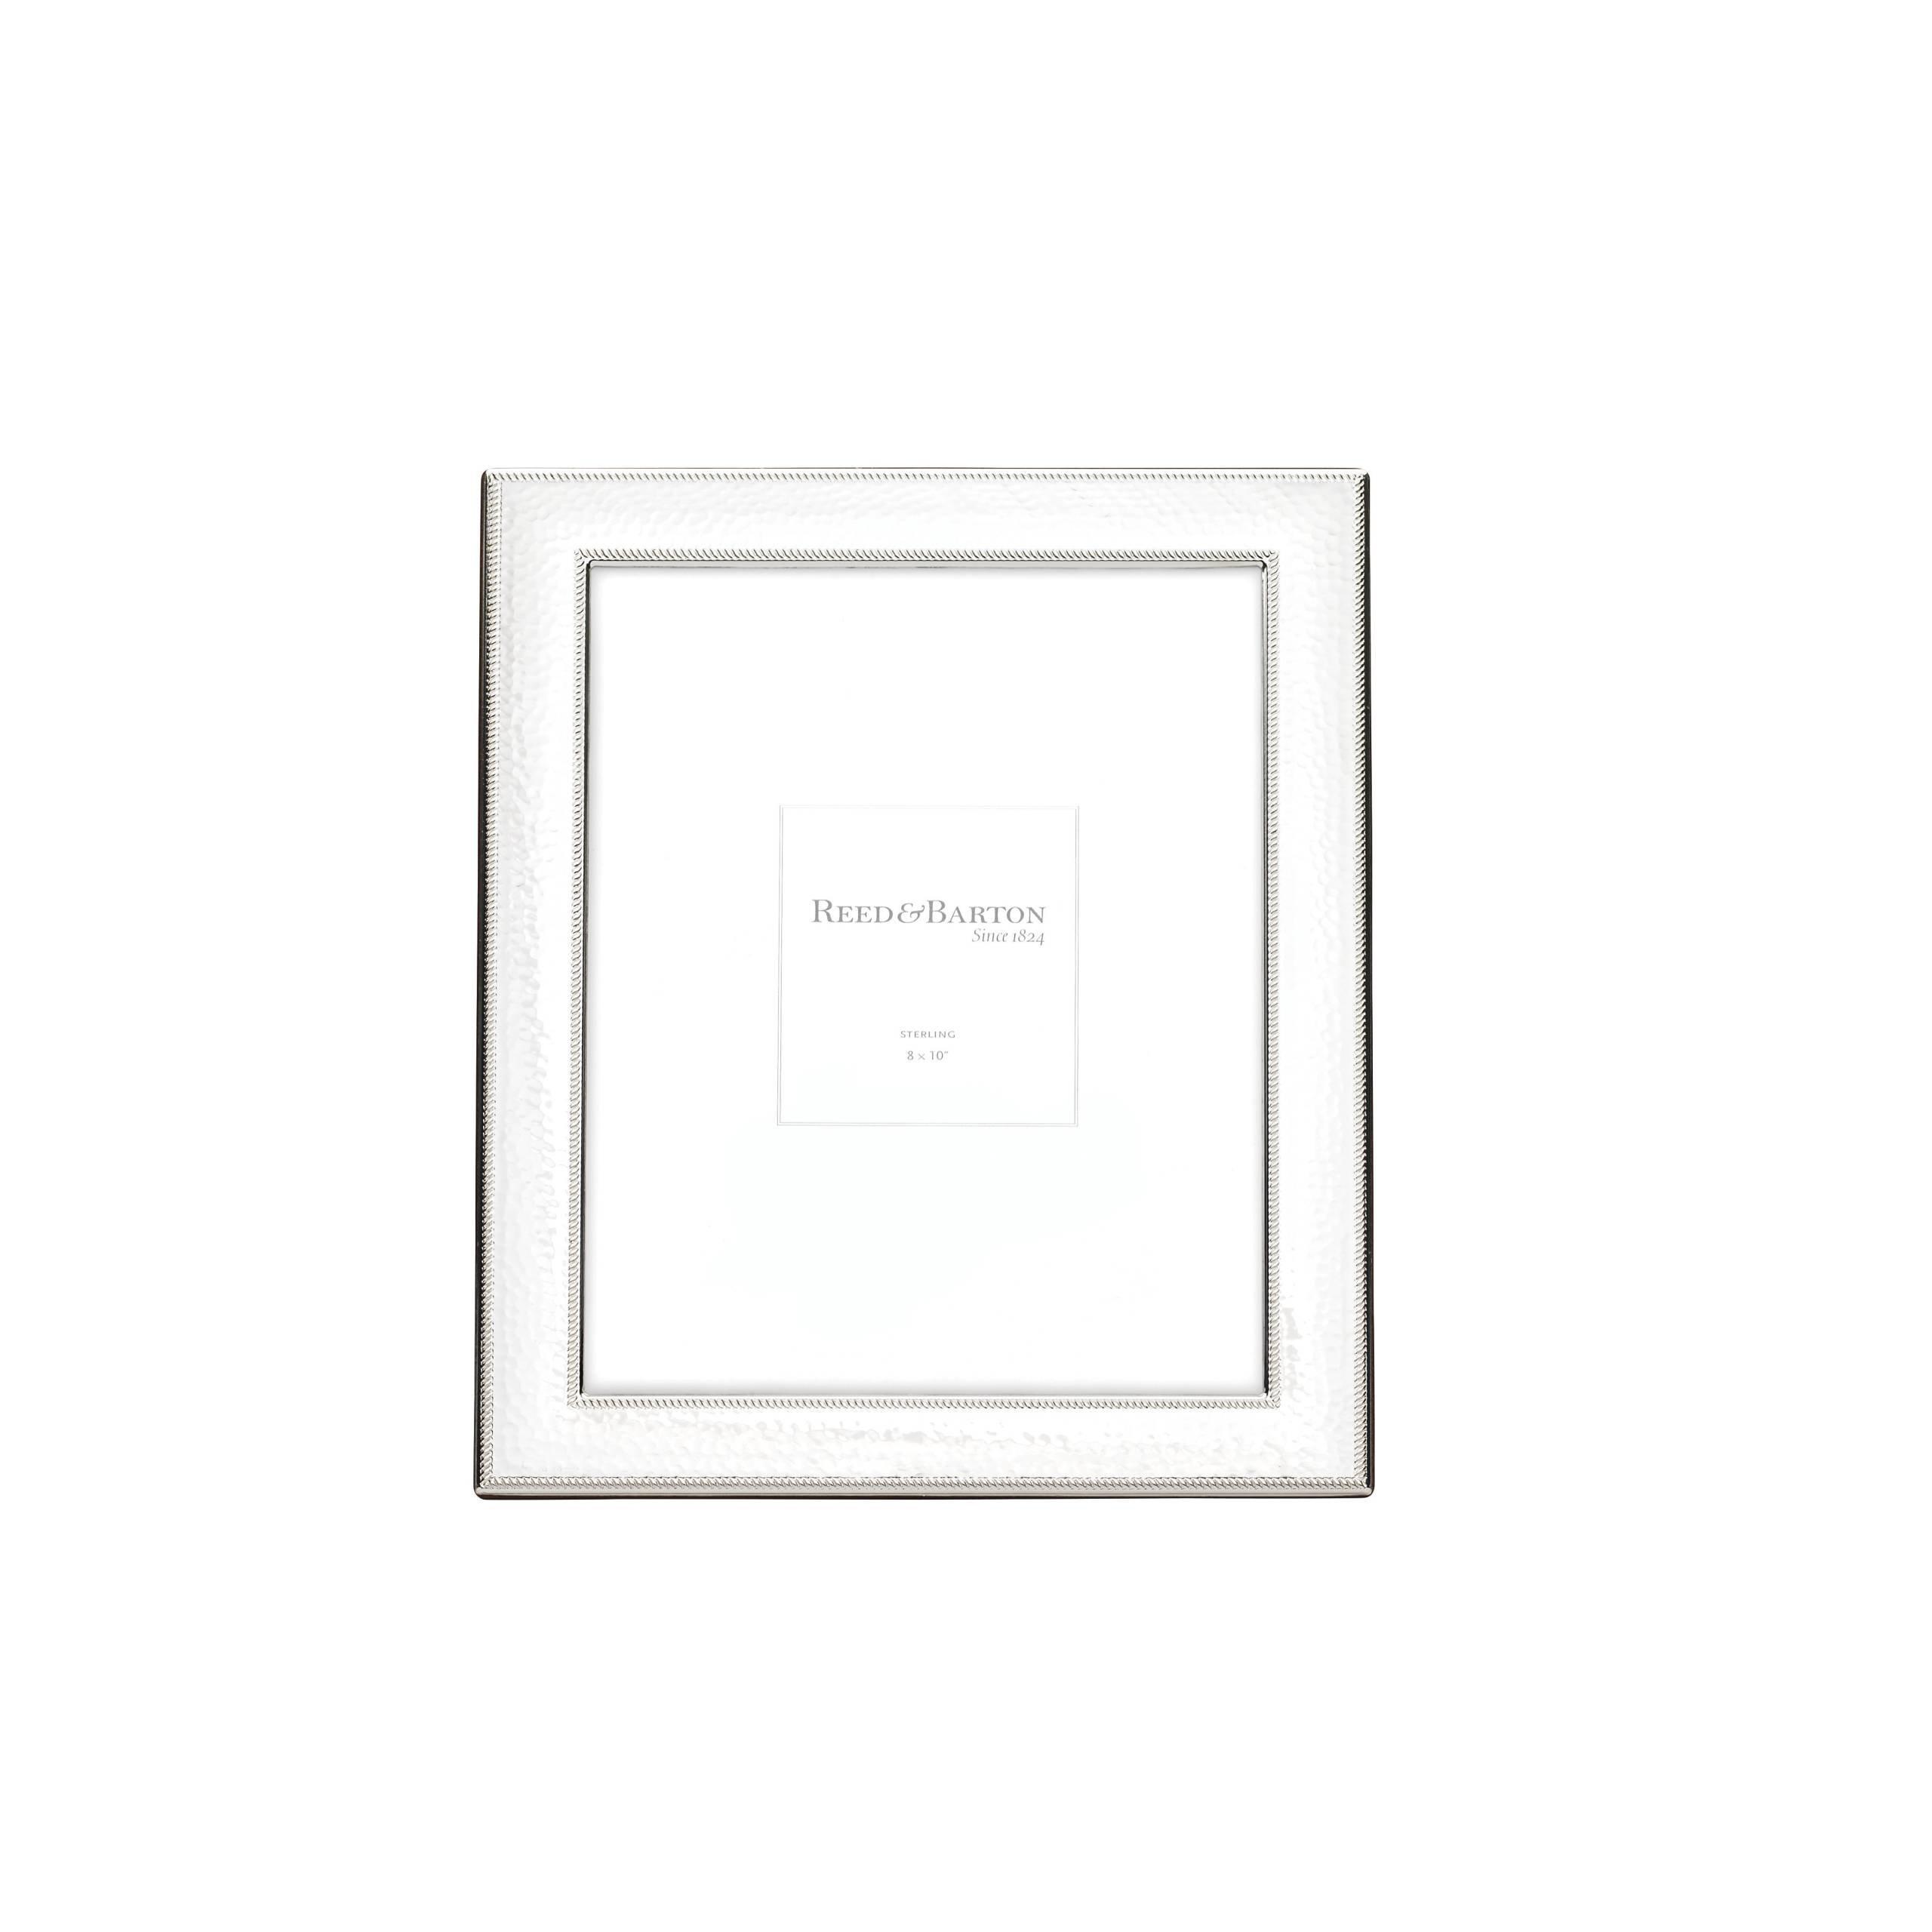 Reed & Barton Bristol Sterling 8'' x 10'' Frame